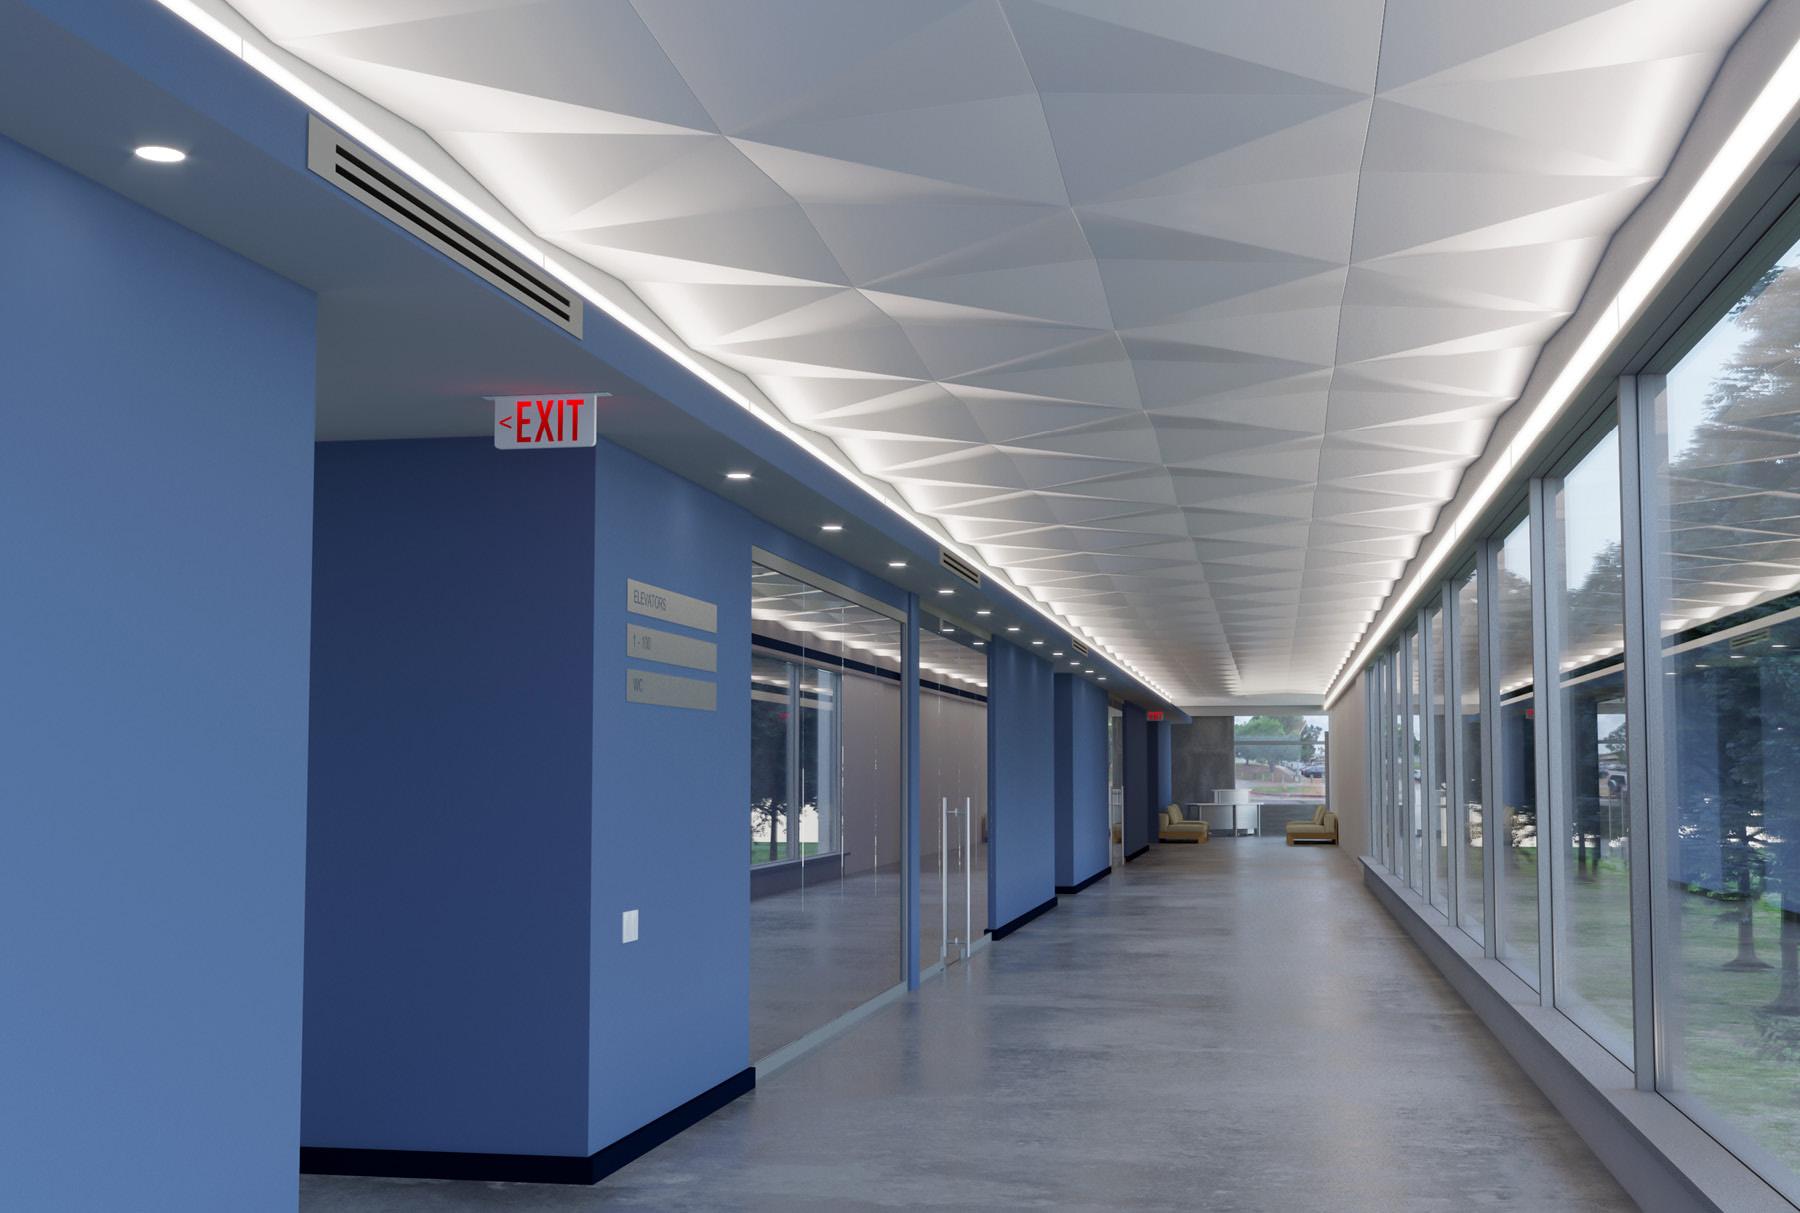 Delta Drop® 4x4 Full Solid installed above hallway